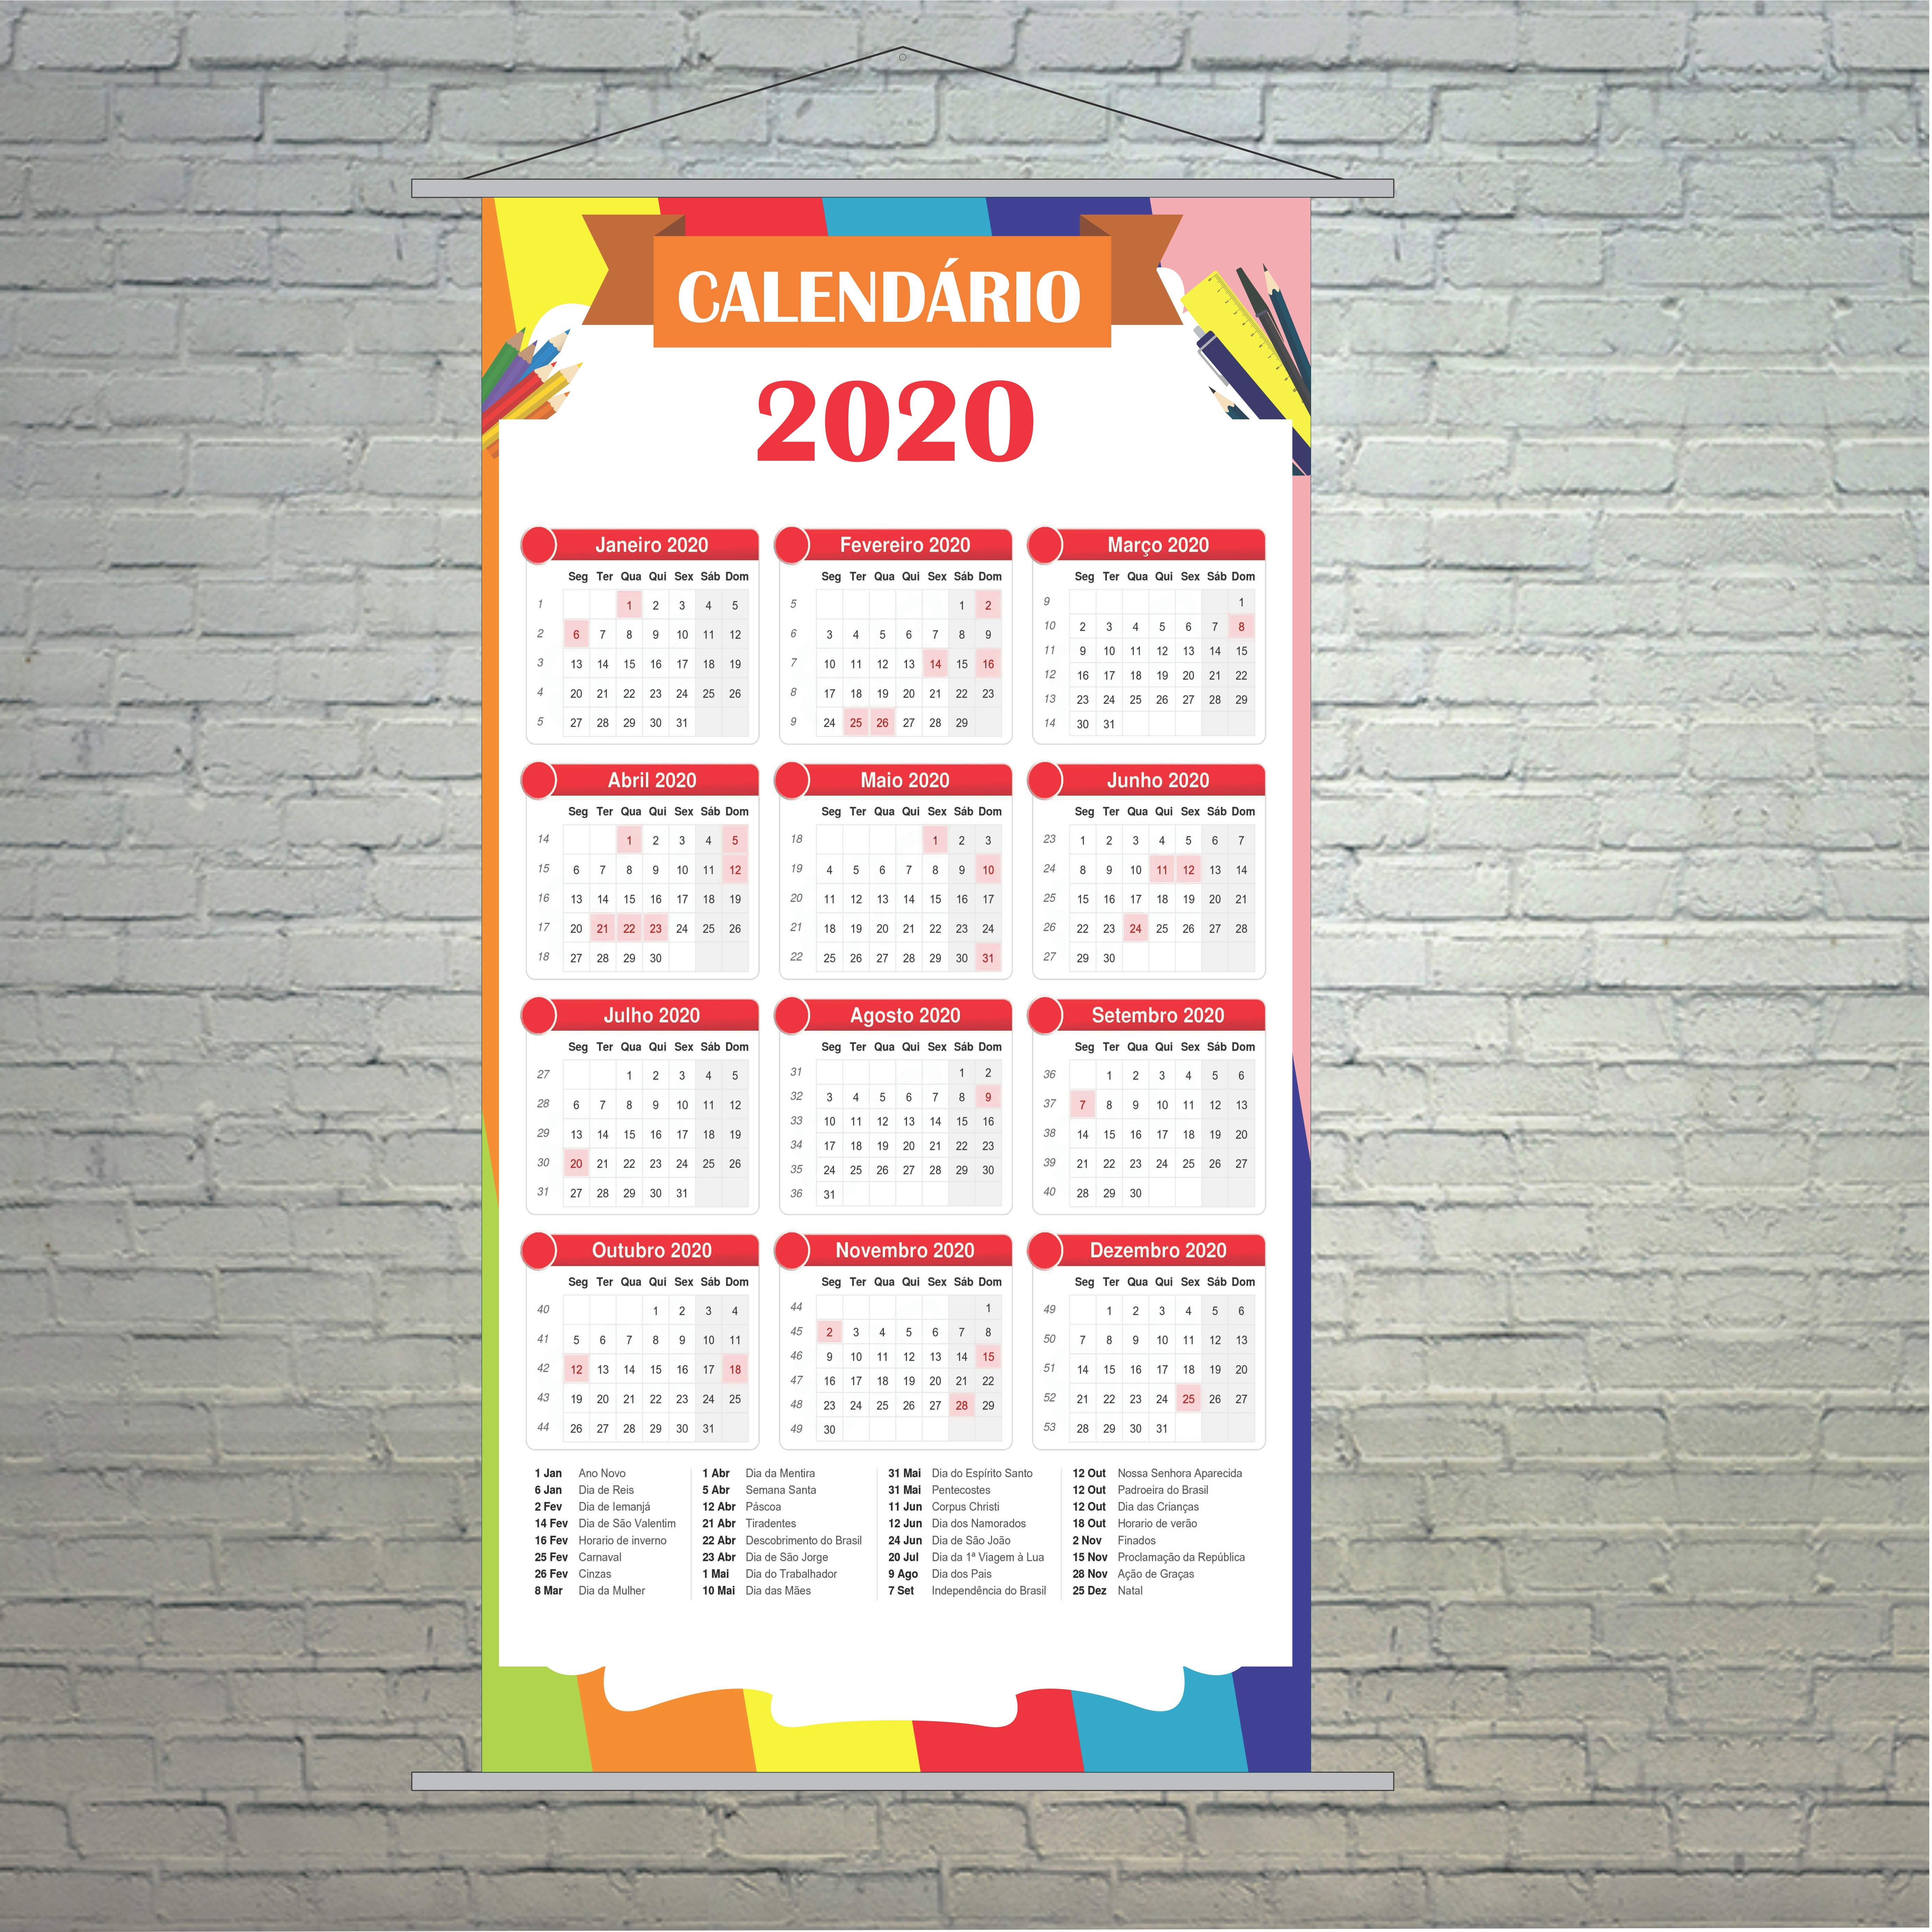 Calendario Janeiro 2020 Brasil Más Recientemente Liberado Calendarios Pedagogicos Of Calendario Janeiro 2020 Brasil Más Recientes Root